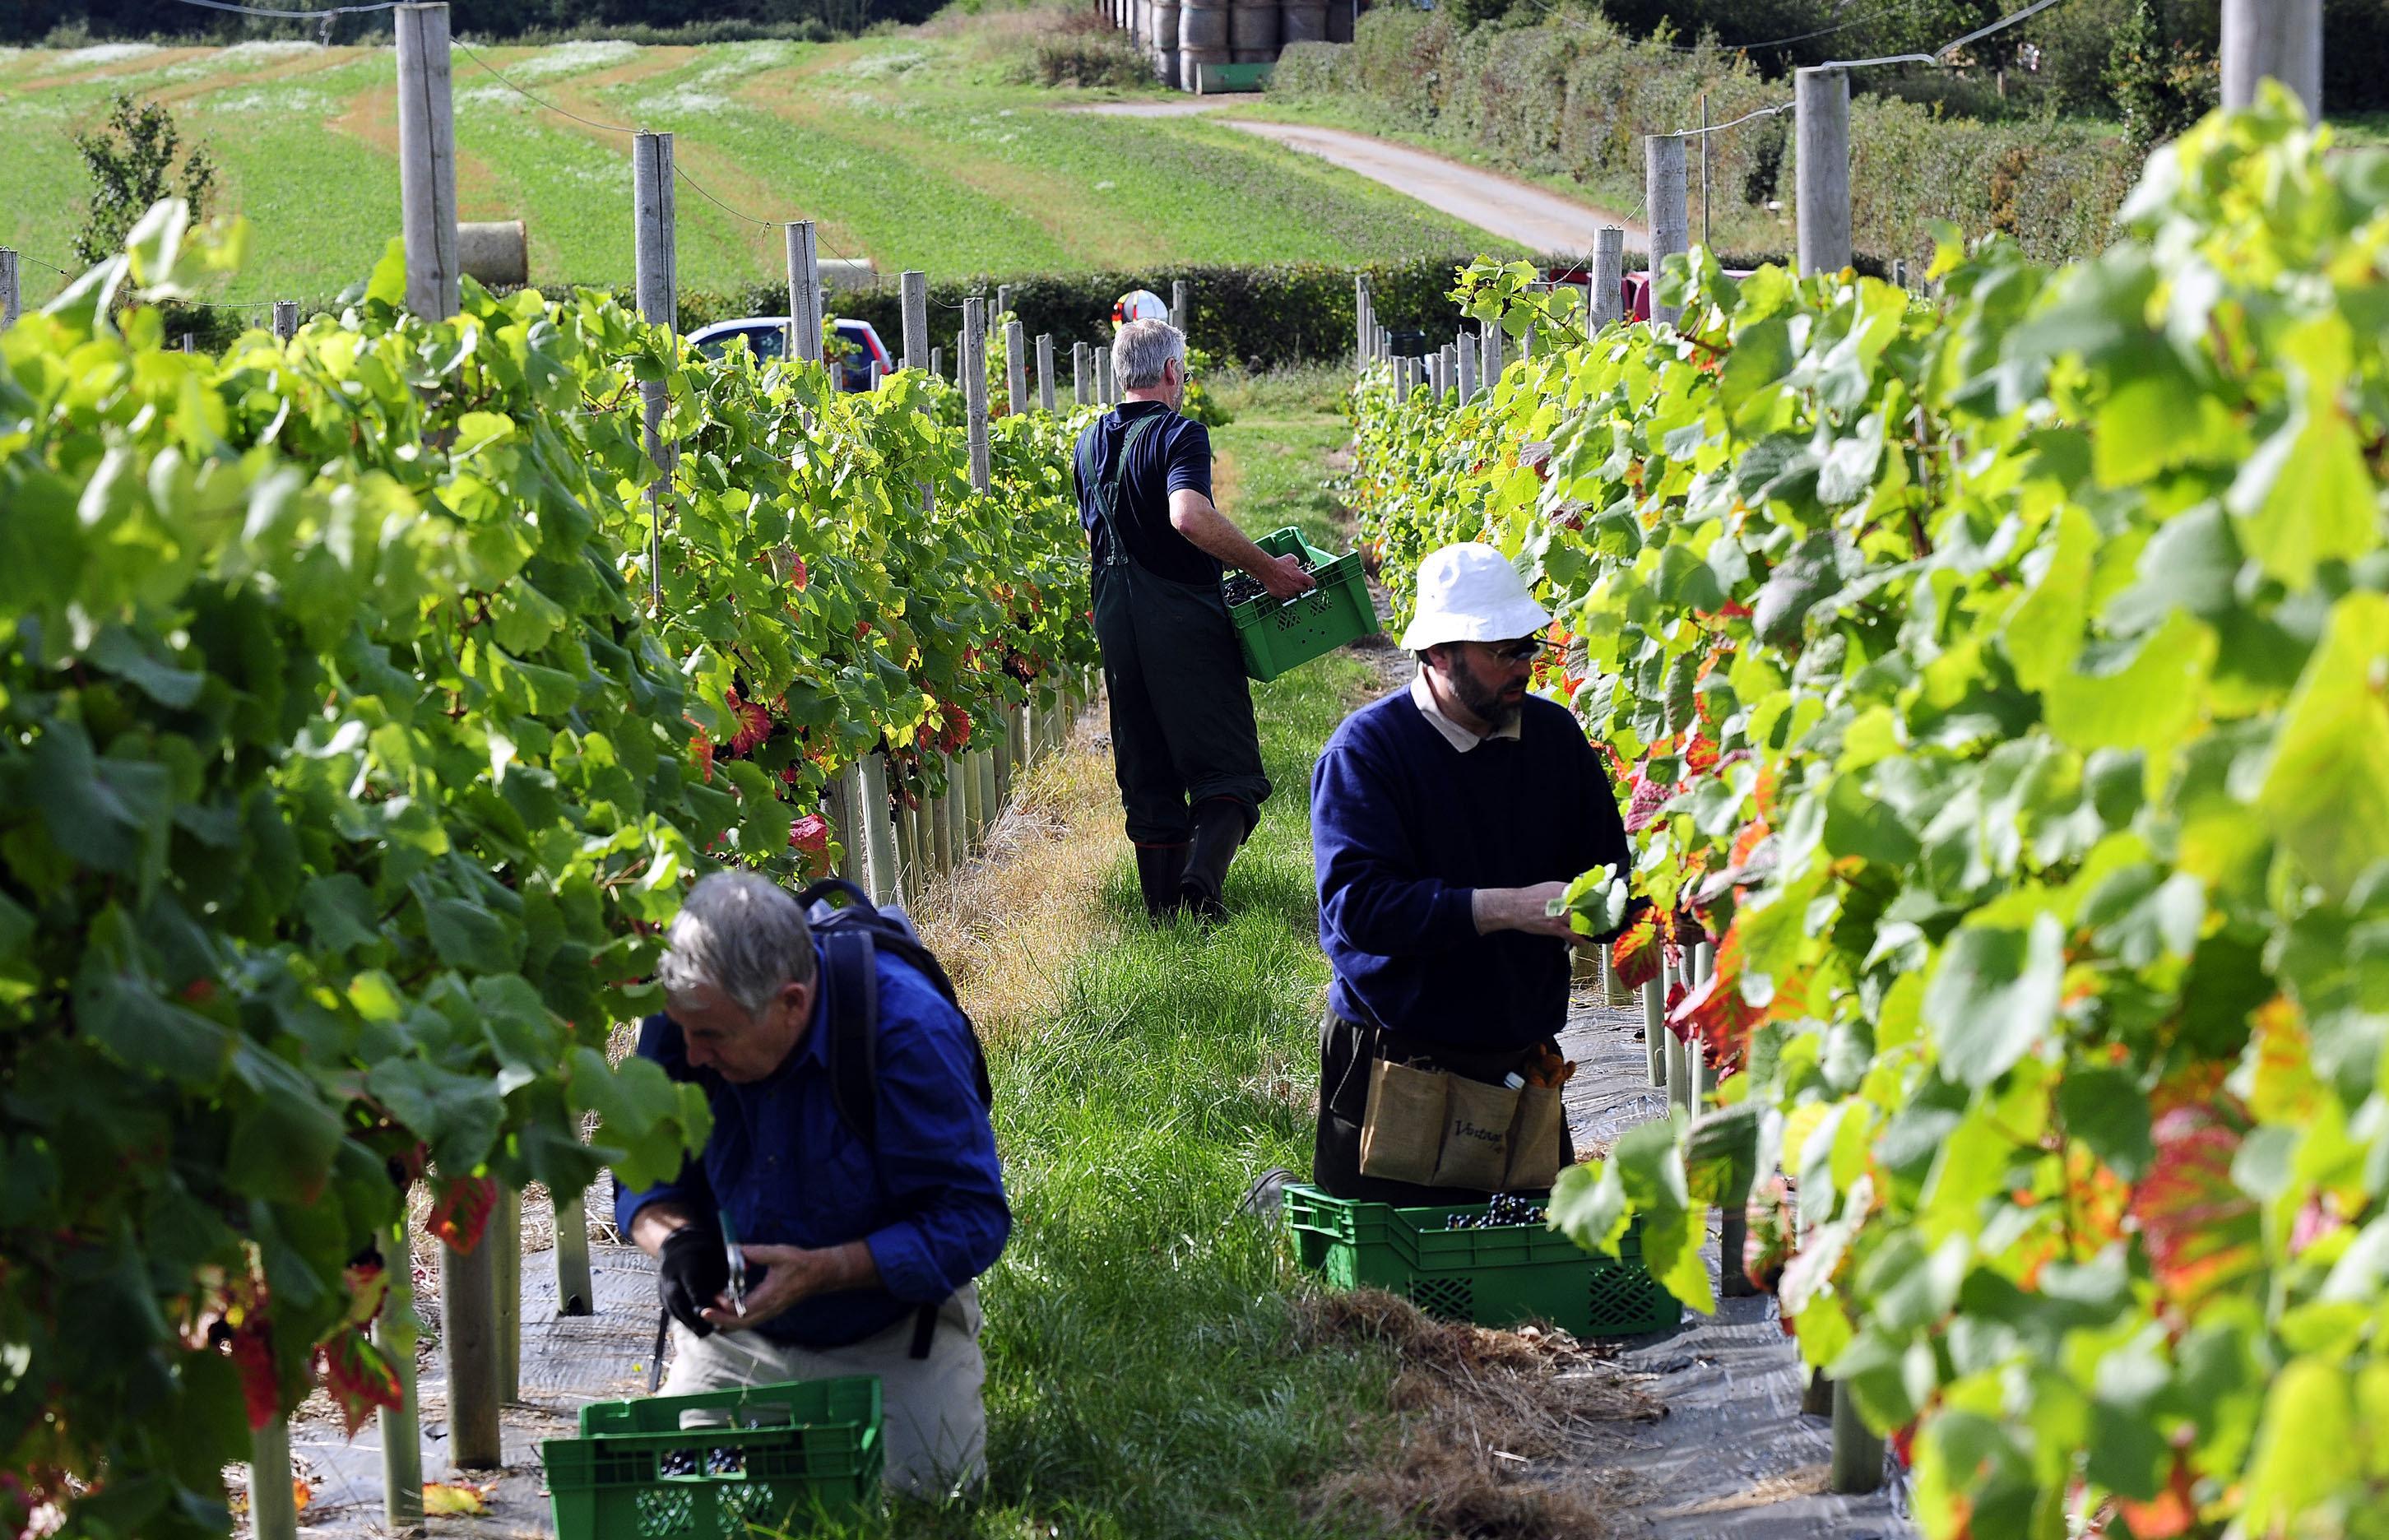 Fruit pickers are among those often employed on zero-hour